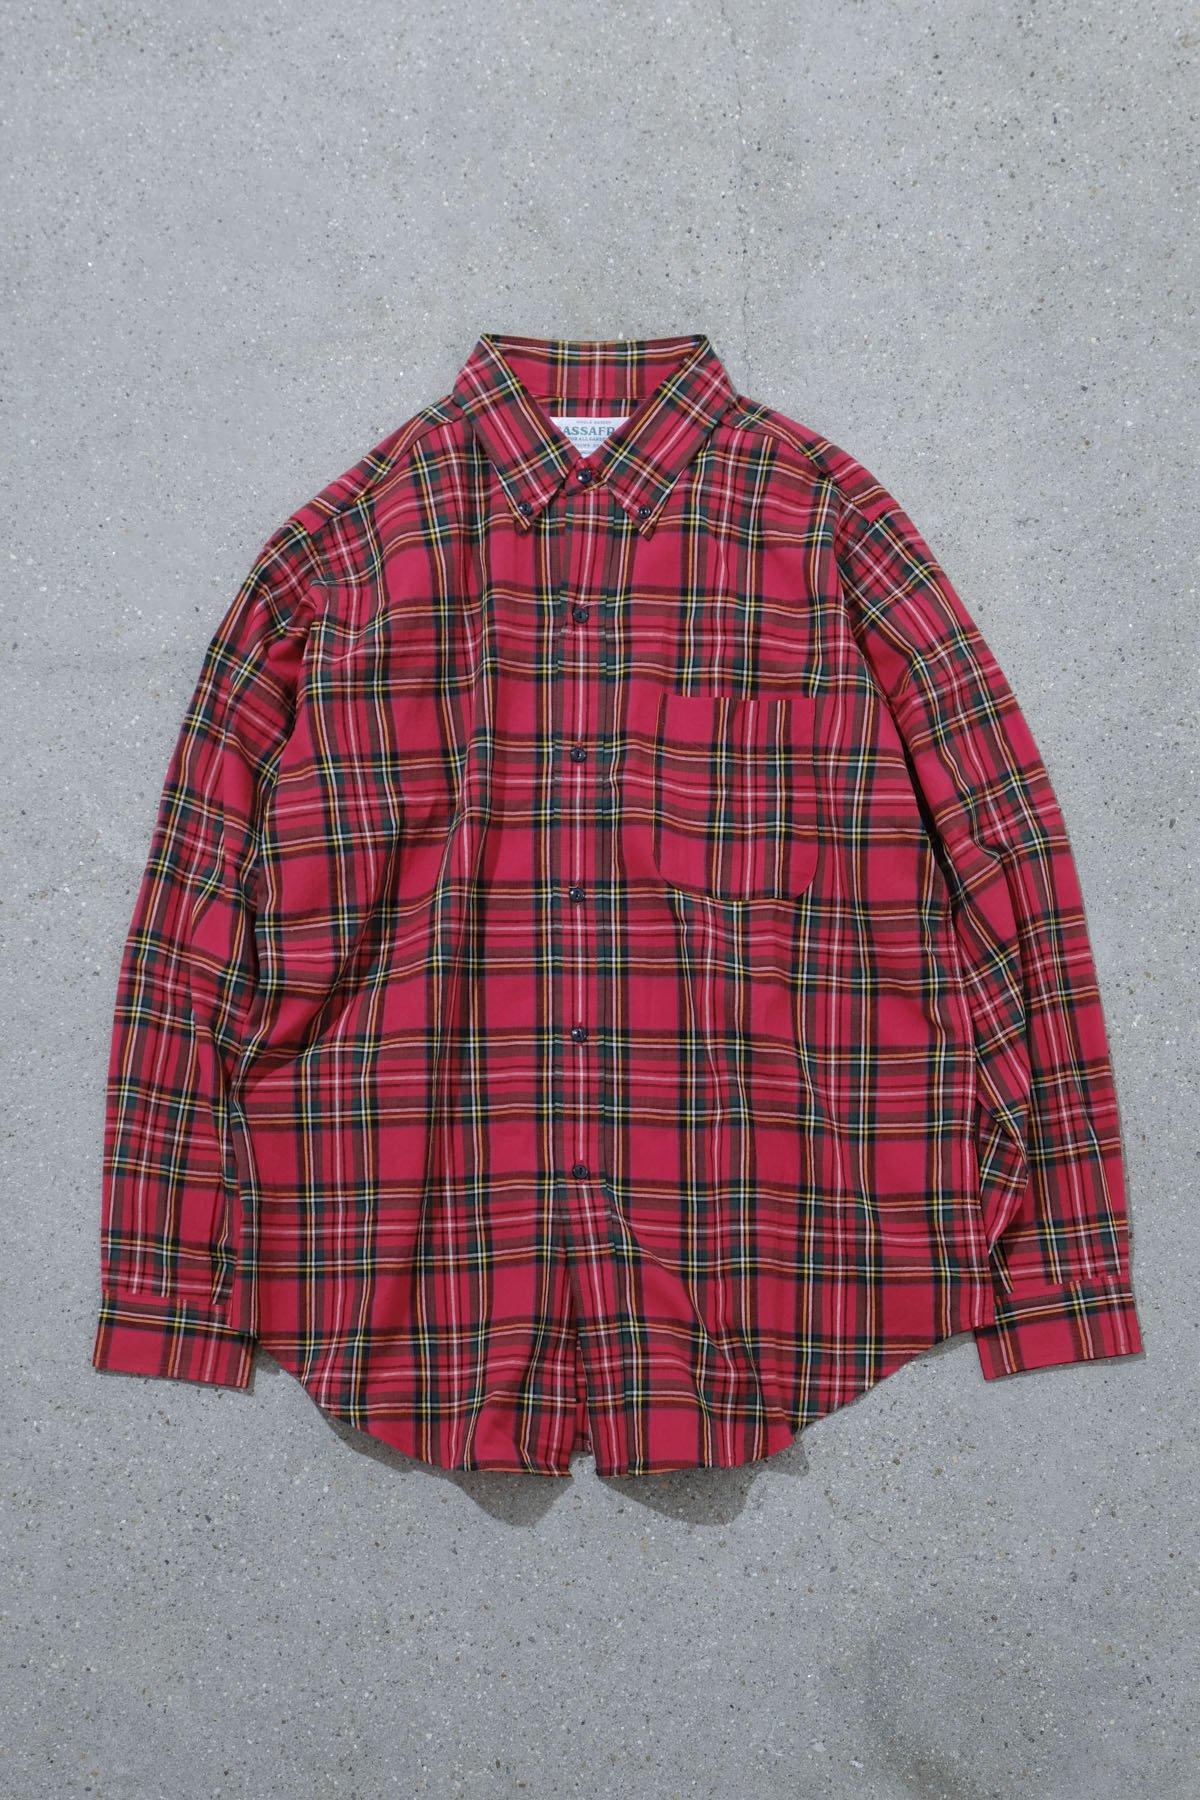 SASSAFRAS / Creen Thumb Shirt RED